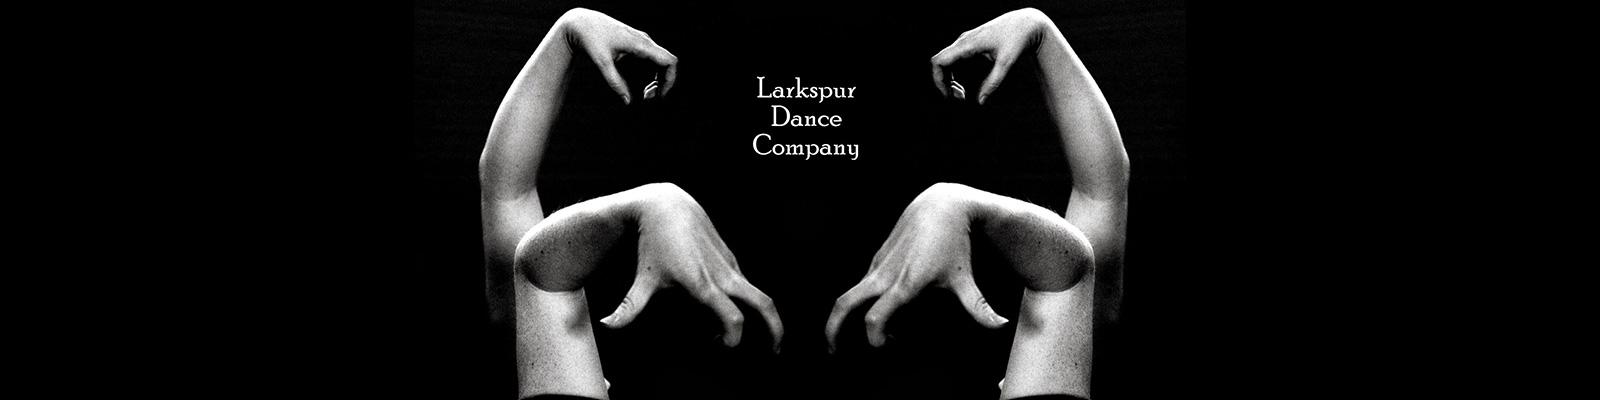 Larkspur Dance Company Logo